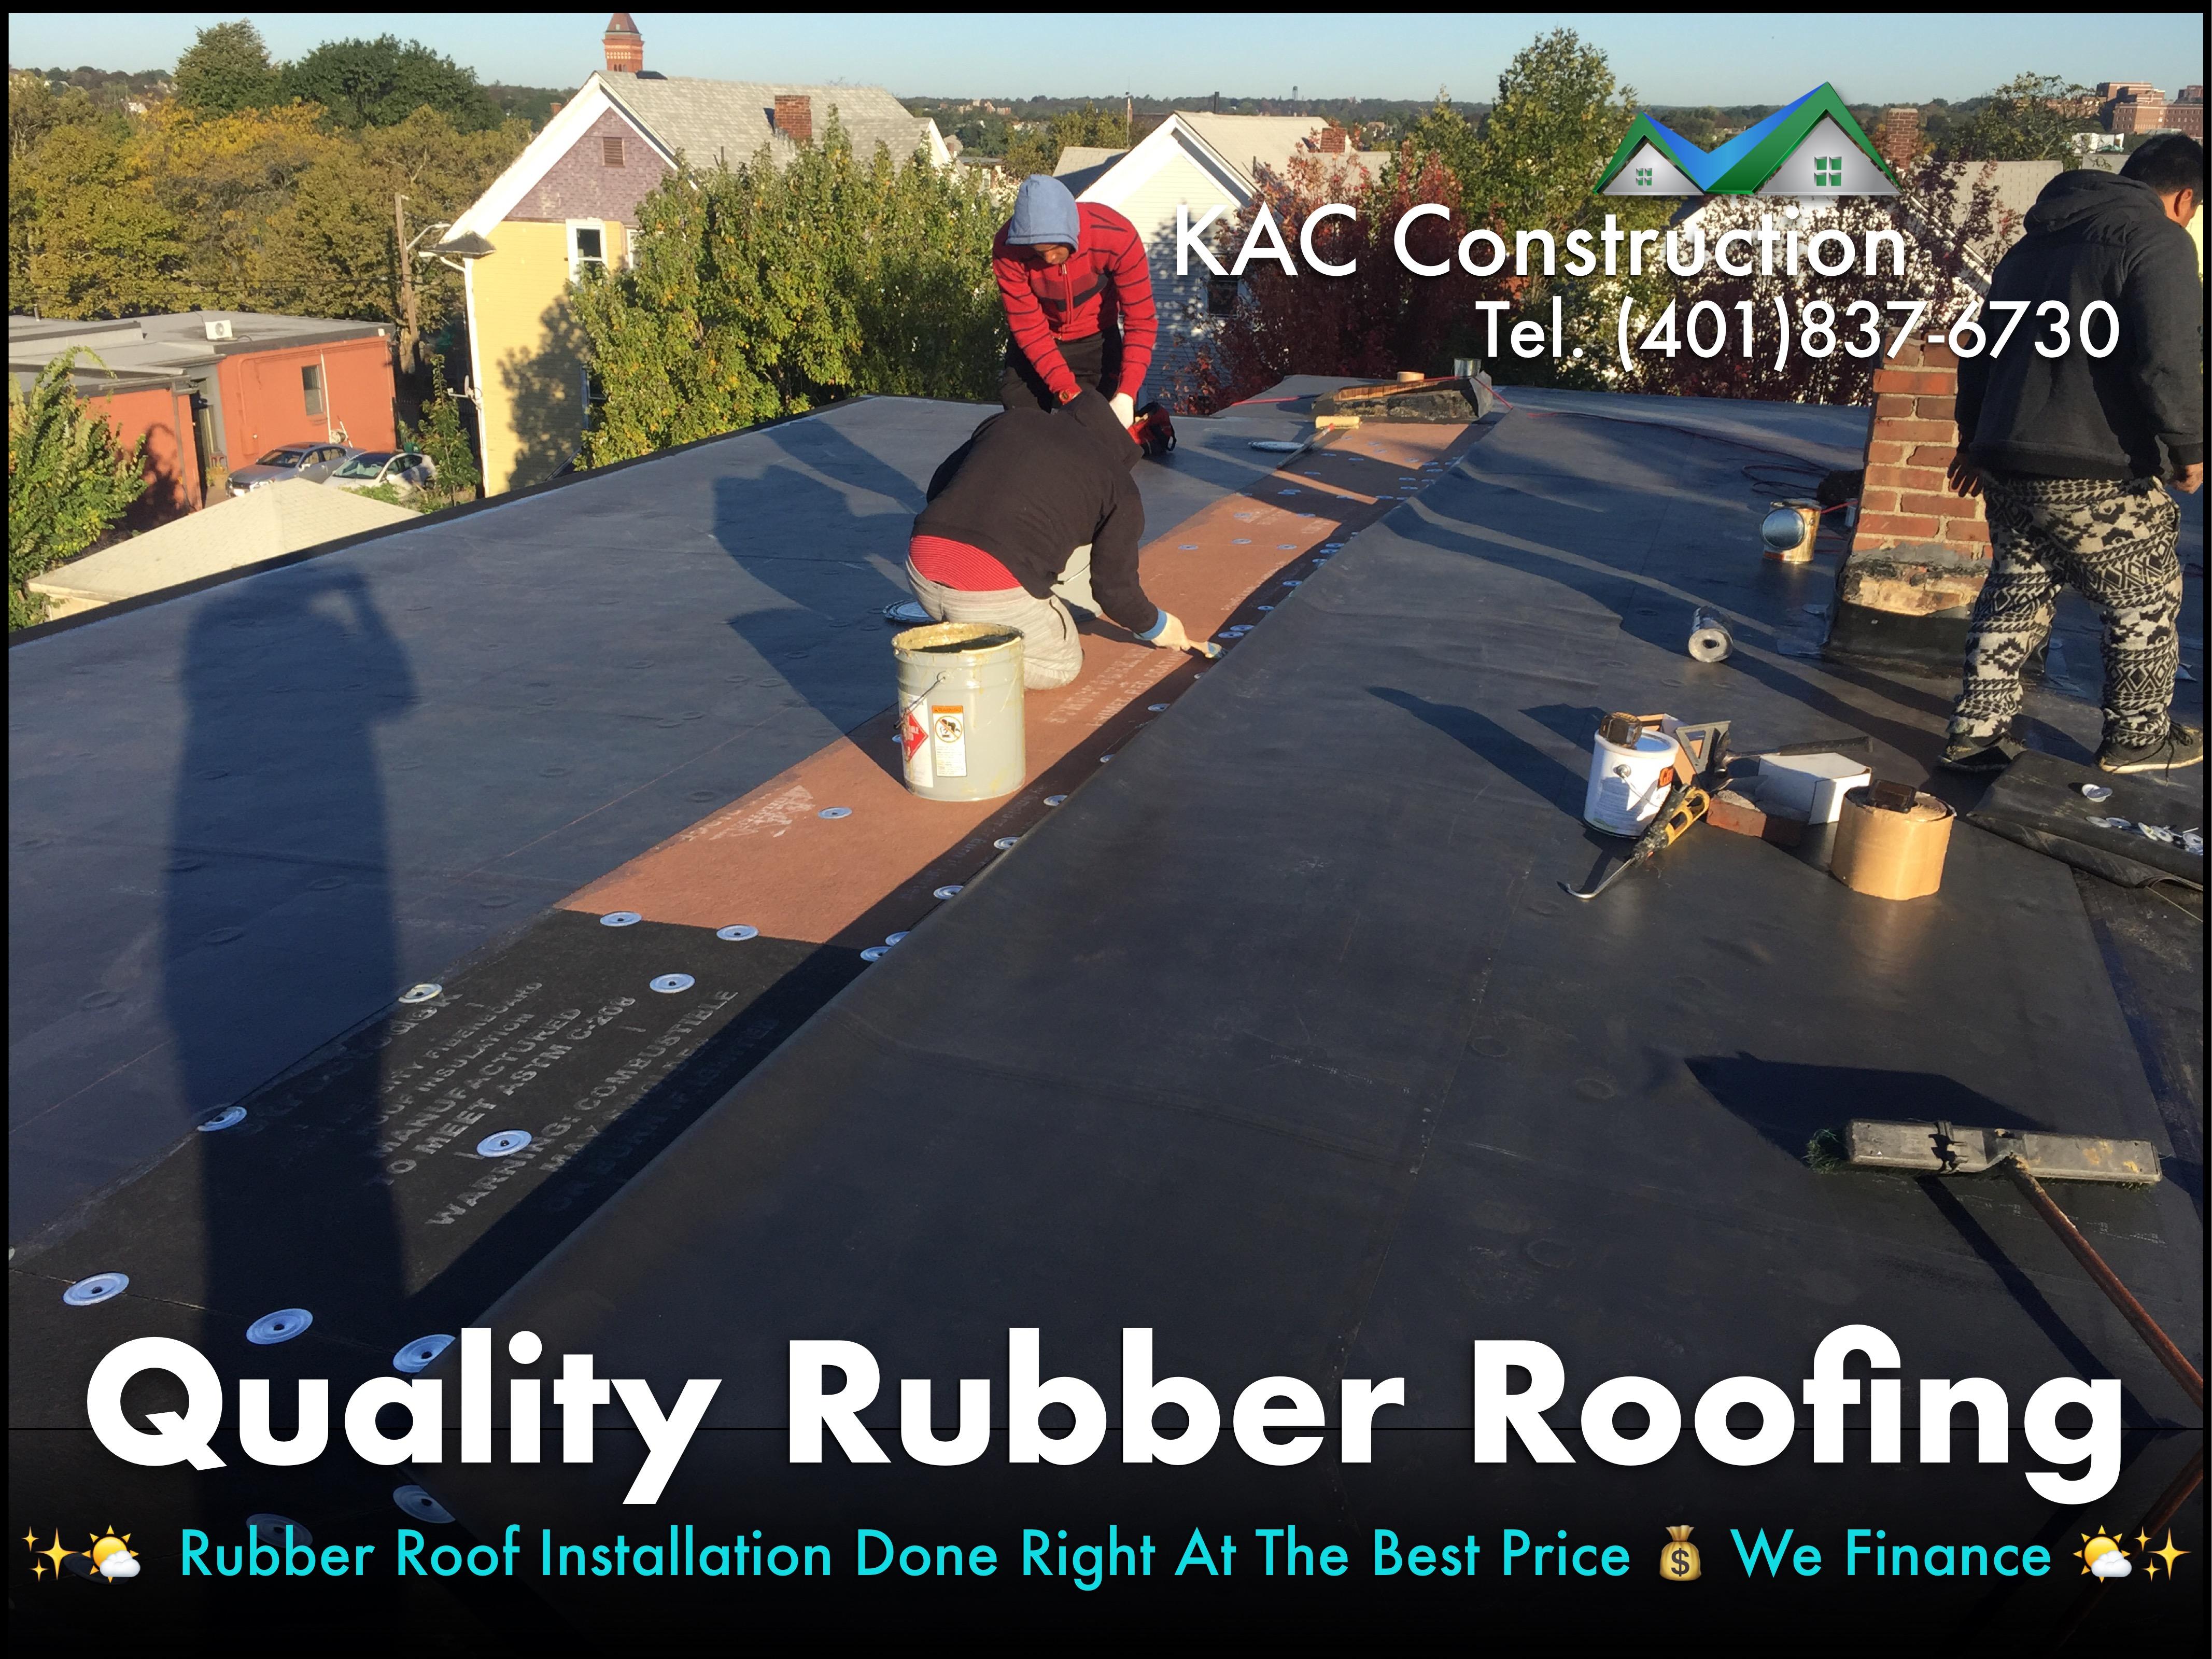 Rubber roof, rubber roof contractor ri, rubber roof contractor in RI, rubber roof contractors ri, rubber roof contractors in RI, rubber roof Installation ri,